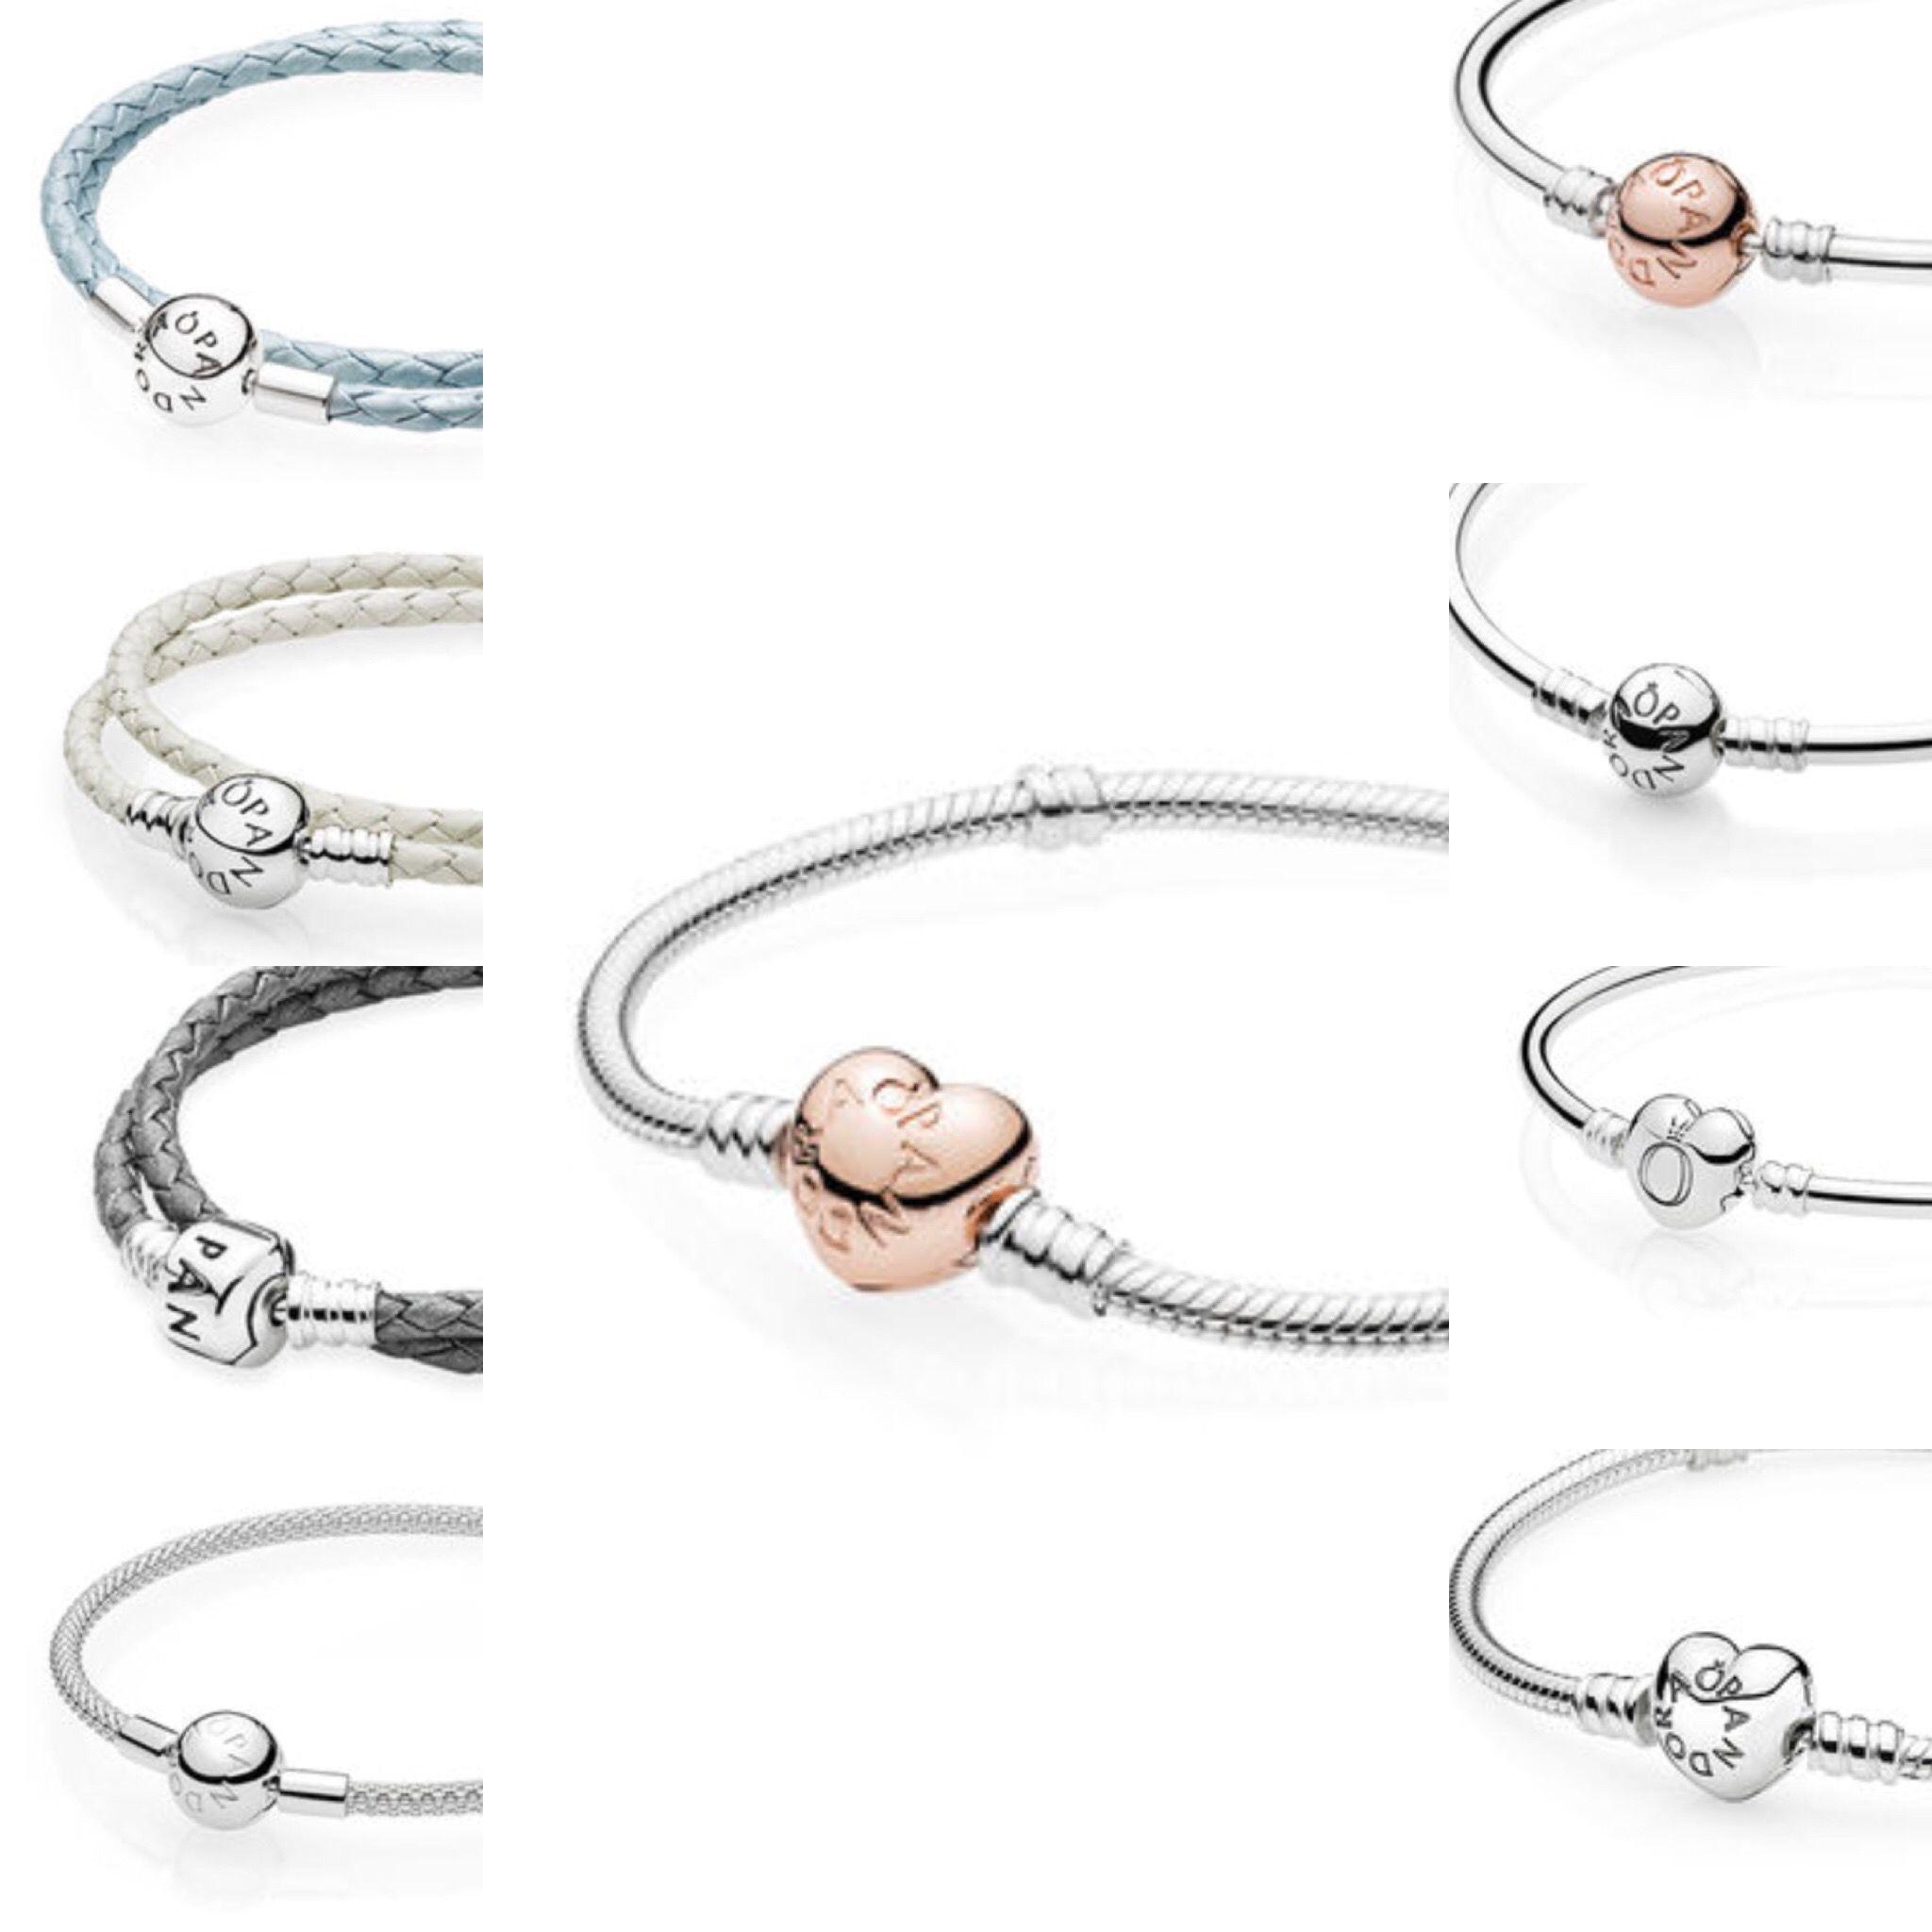 Pandora bracelets, leather, sterling silver, rose gold, gold ...